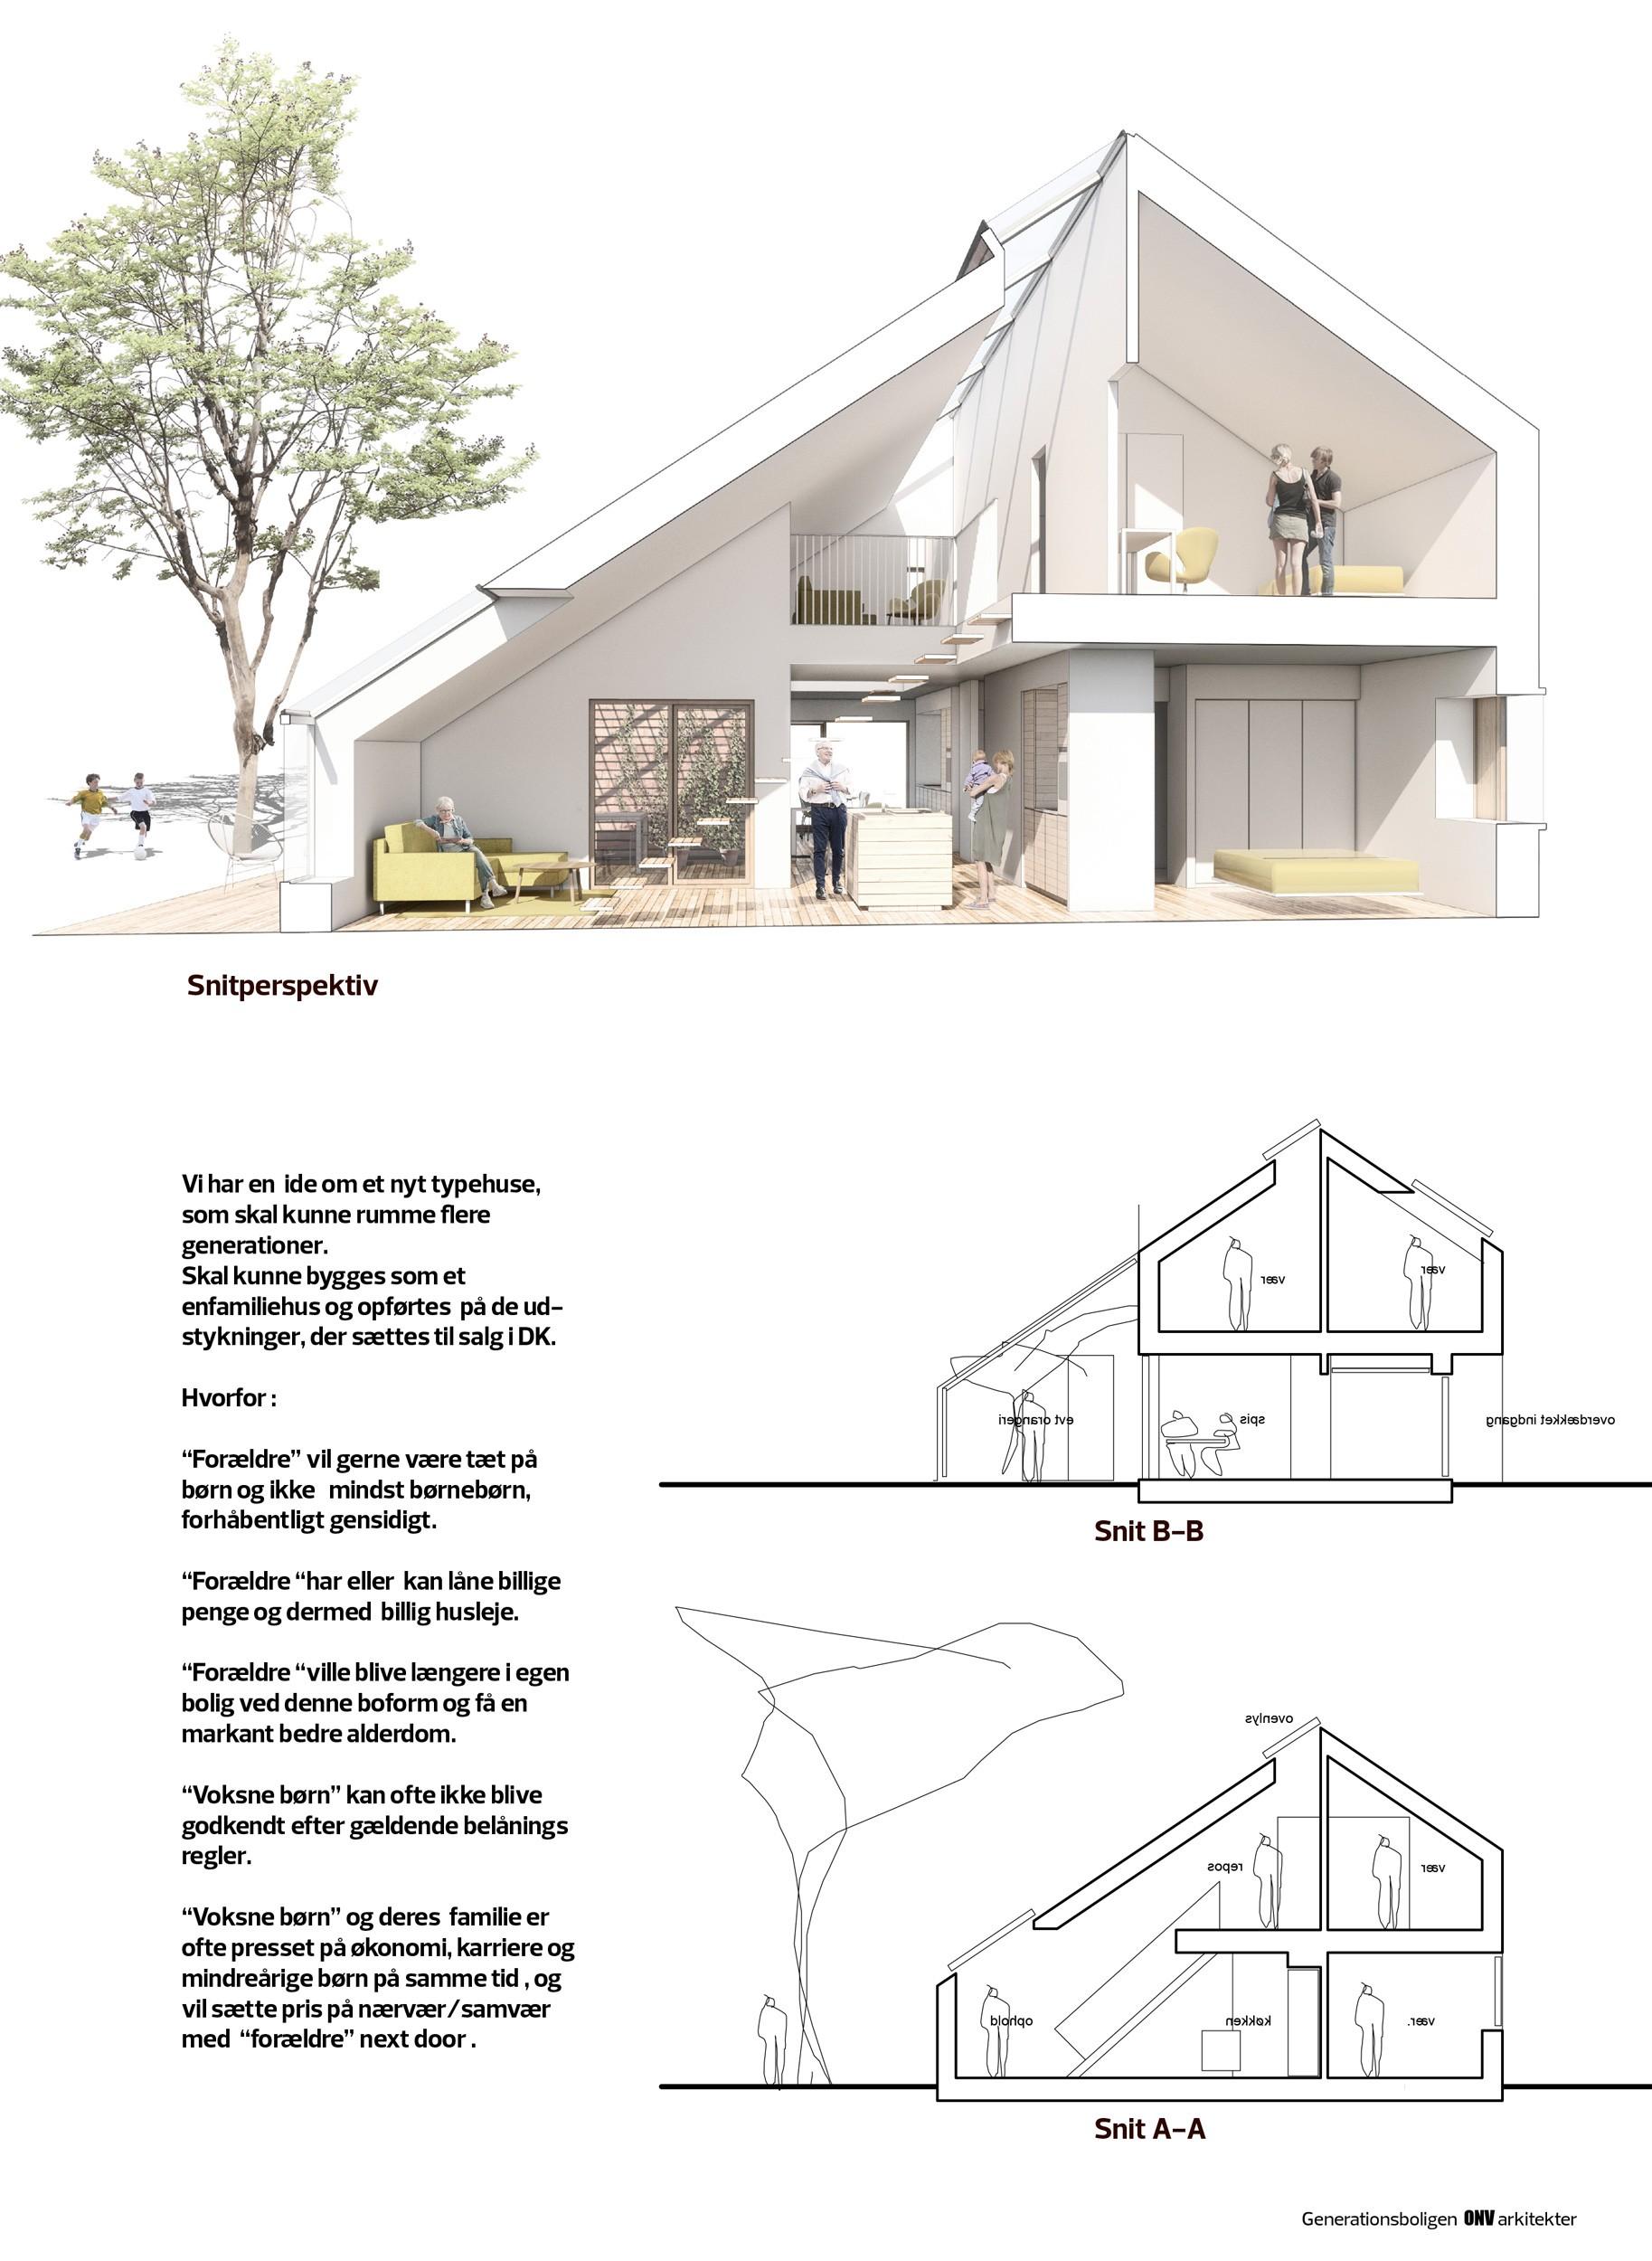 Generationsboligen-typehus-det-fleksible-hus-ONV-arkitekter-03